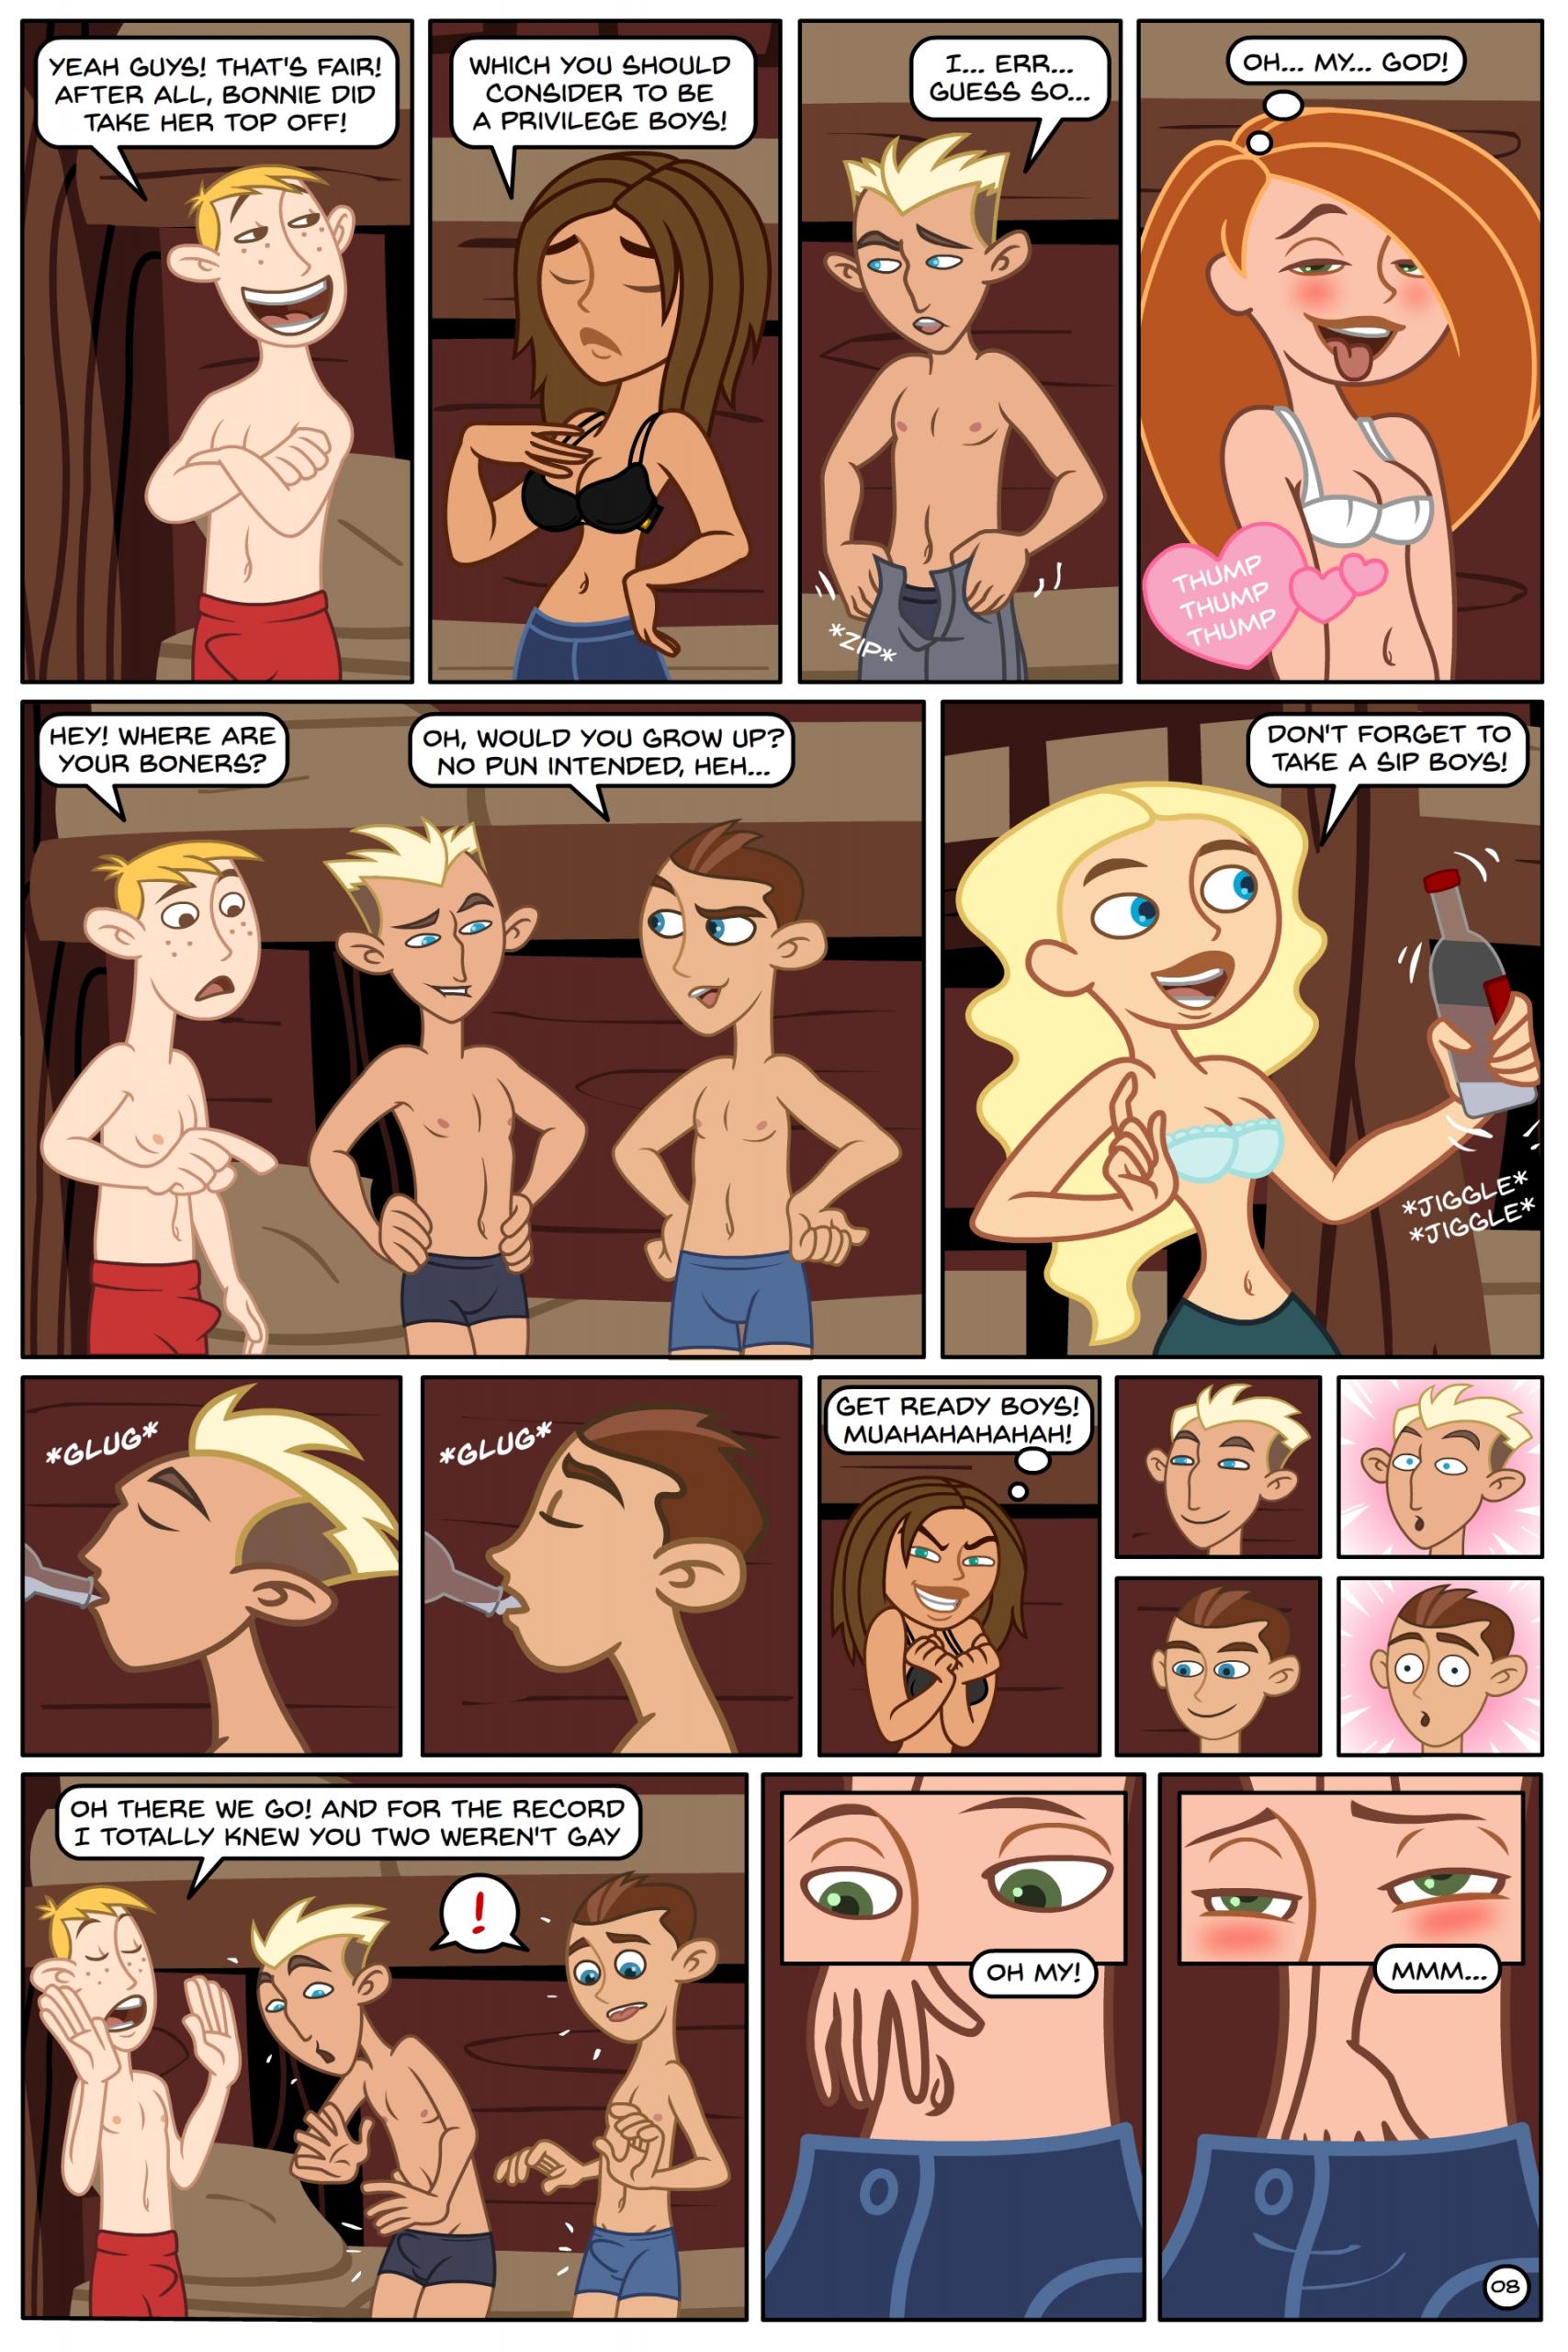 Kim Possible Spin, Sip & Strip! porn comics Oral sex, Group Sex, Lolicon, Masturbation, Straight Shota